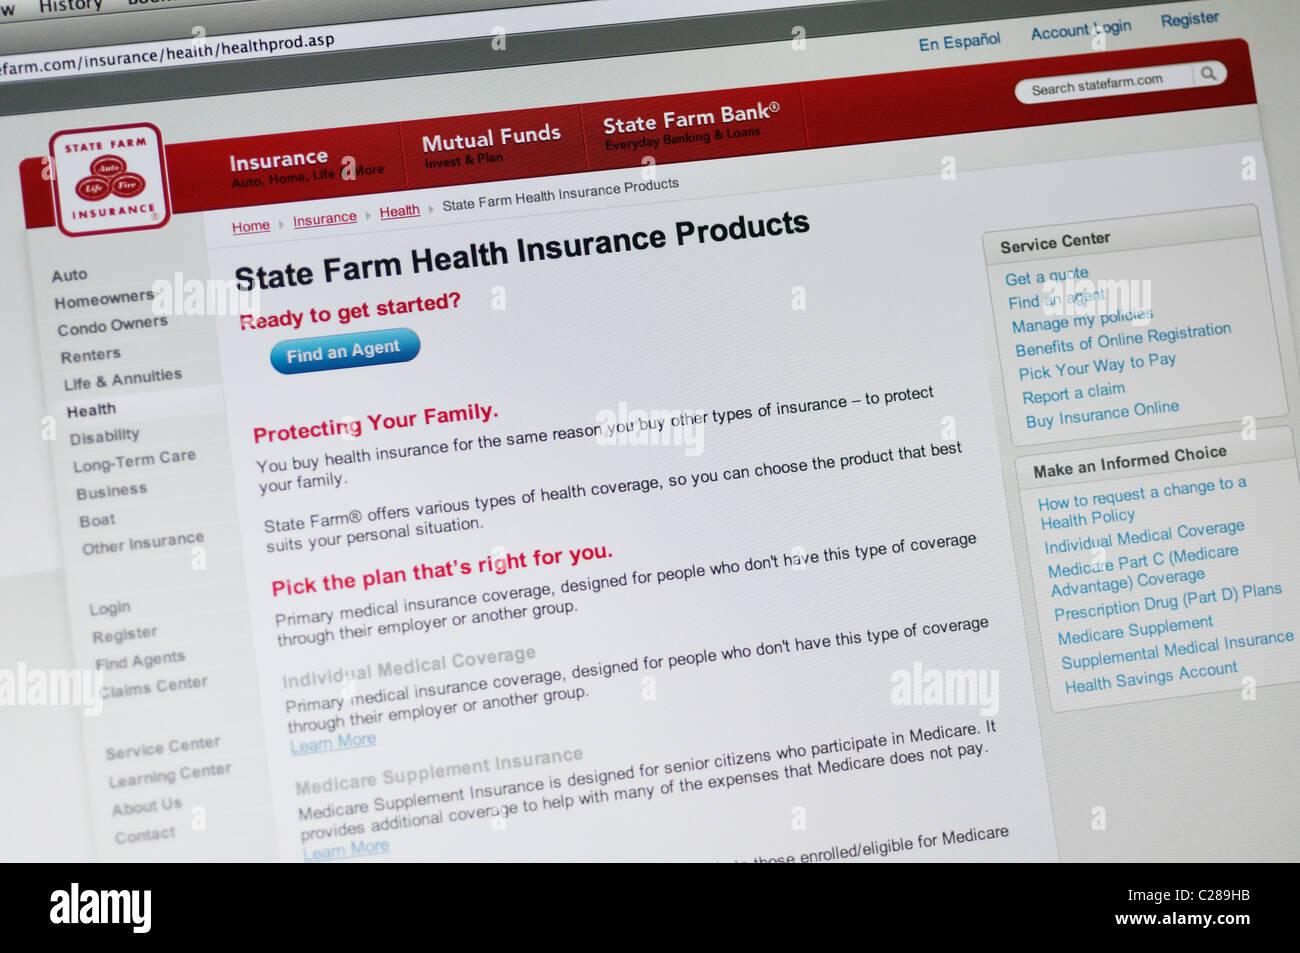 State Farm Report A Claim >> Statefarm Stock Photos Statefarm Stock Images Alamy